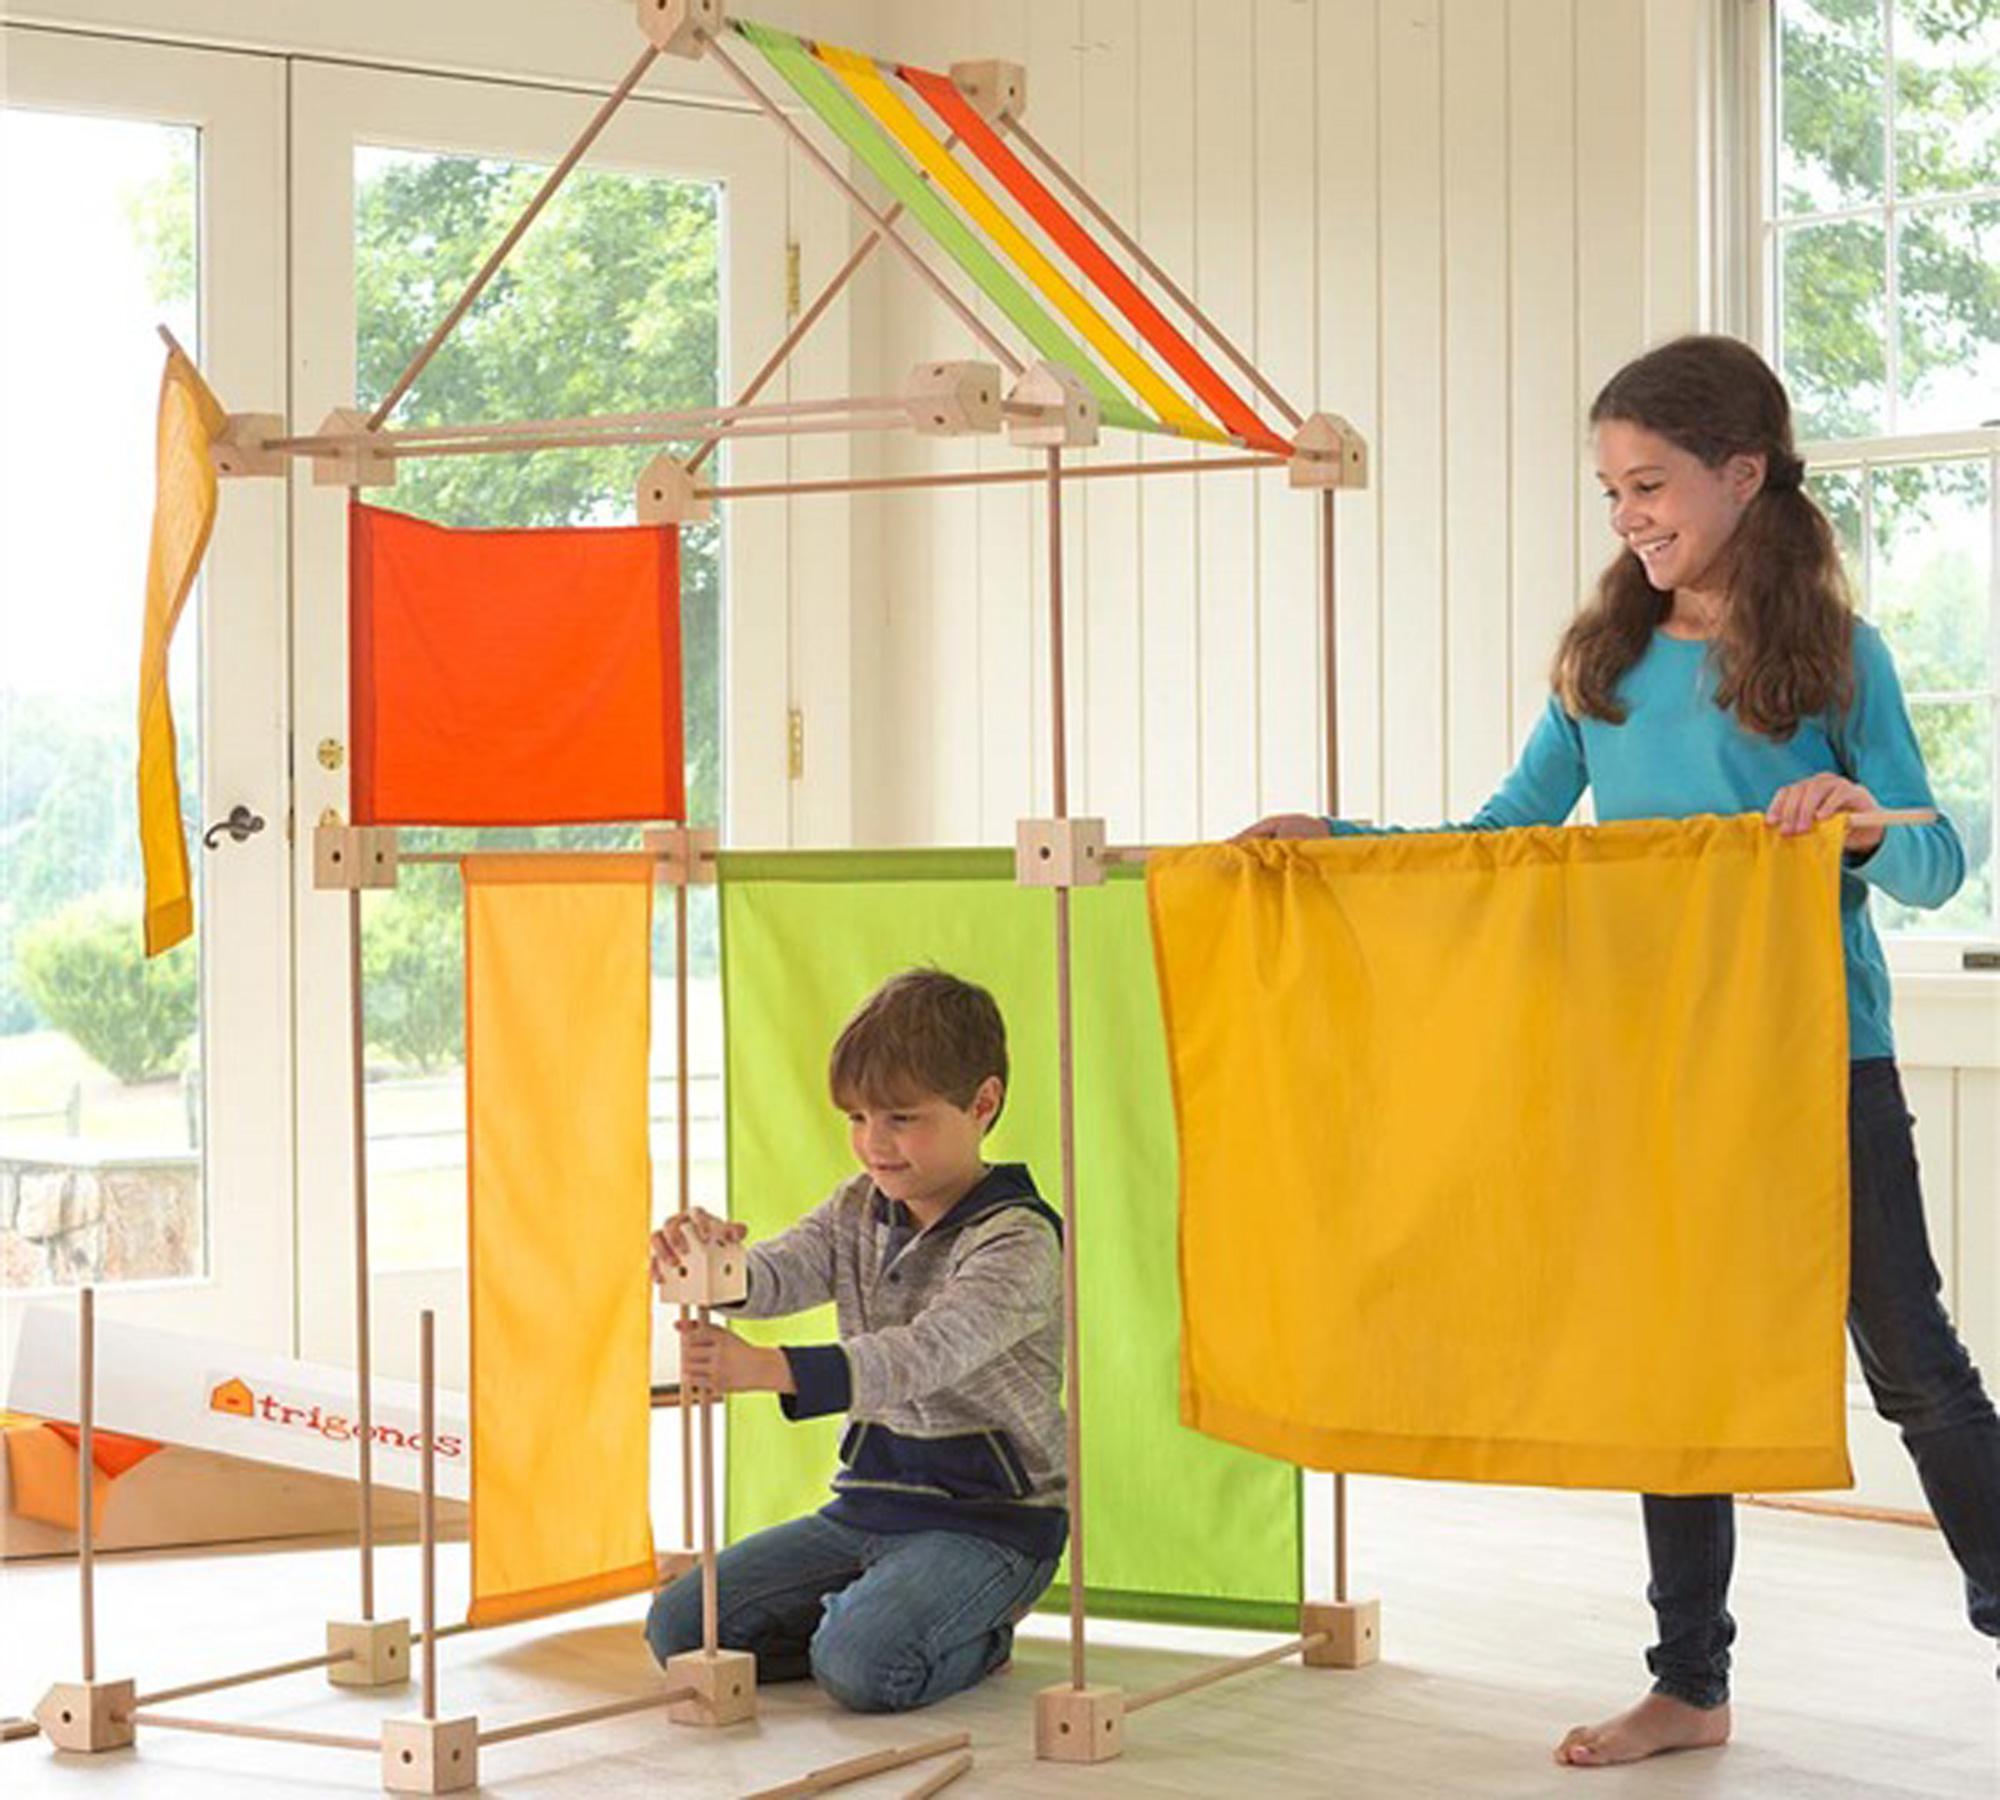 sch n spielzeug f r drau en selber machen tierspielzeug. Black Bedroom Furniture Sets. Home Design Ideas